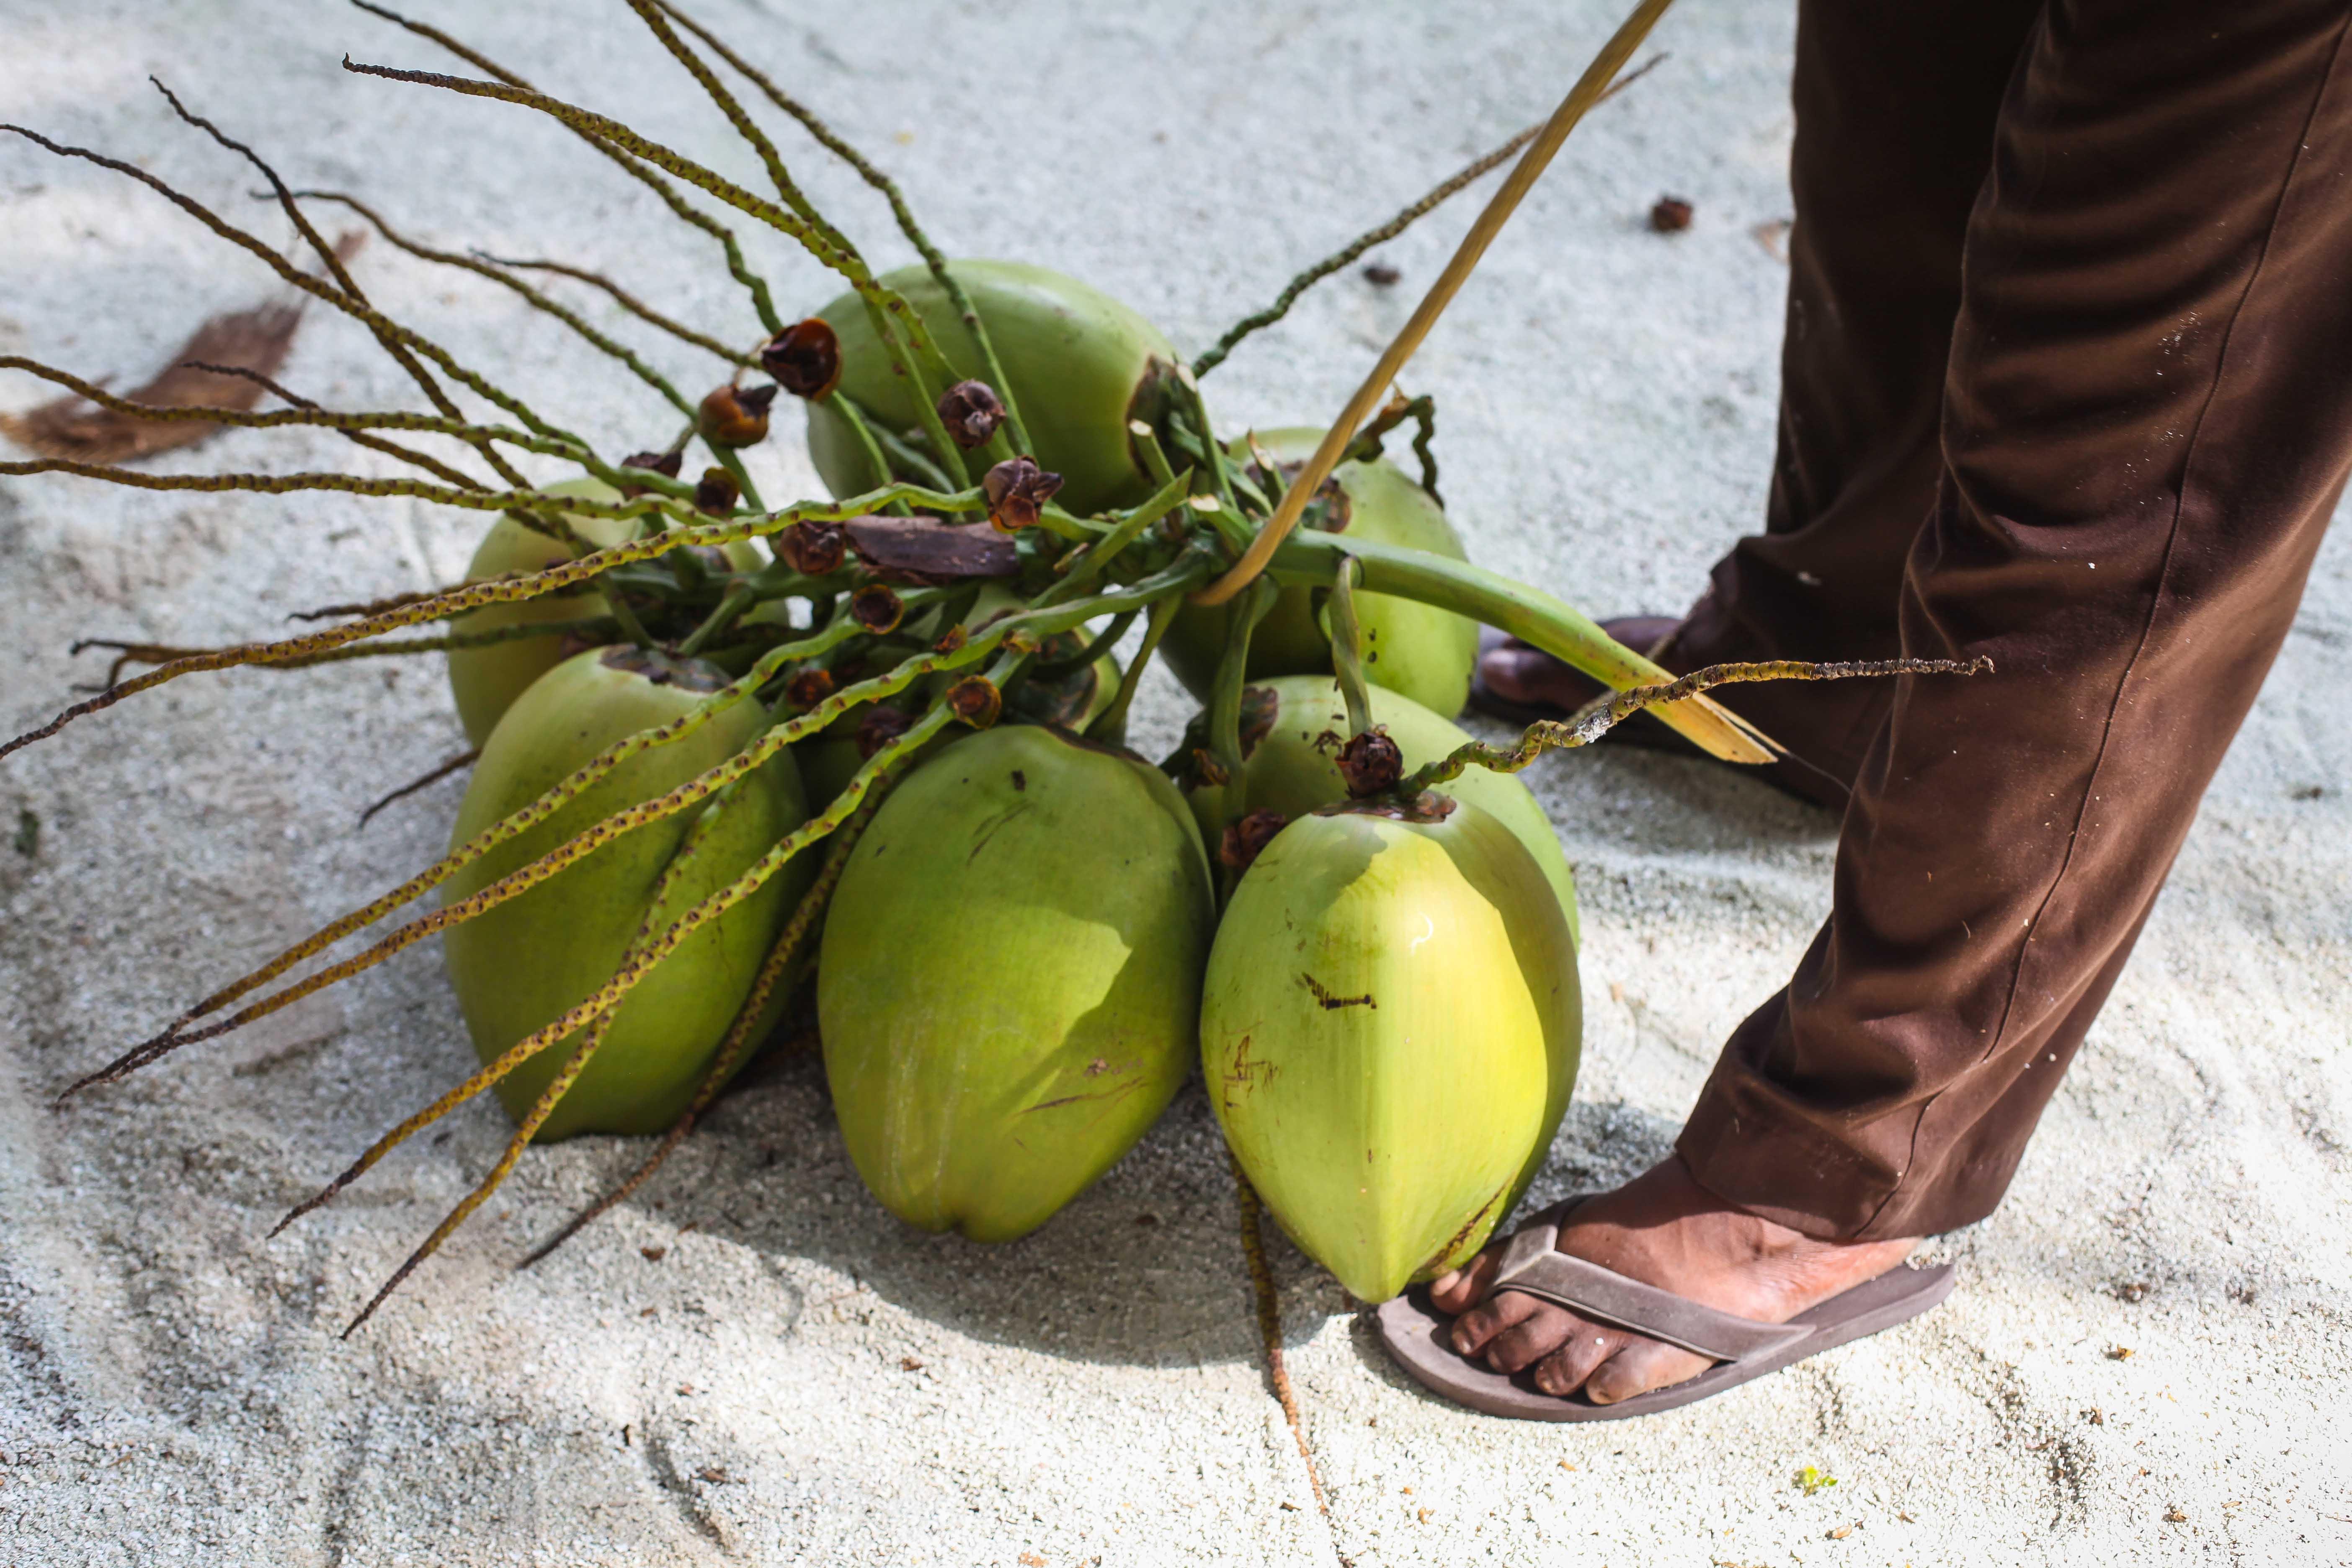 Condor Cocos Cookies Kurumba Zuckerzimtundliebe Malediven Trauminsel-21